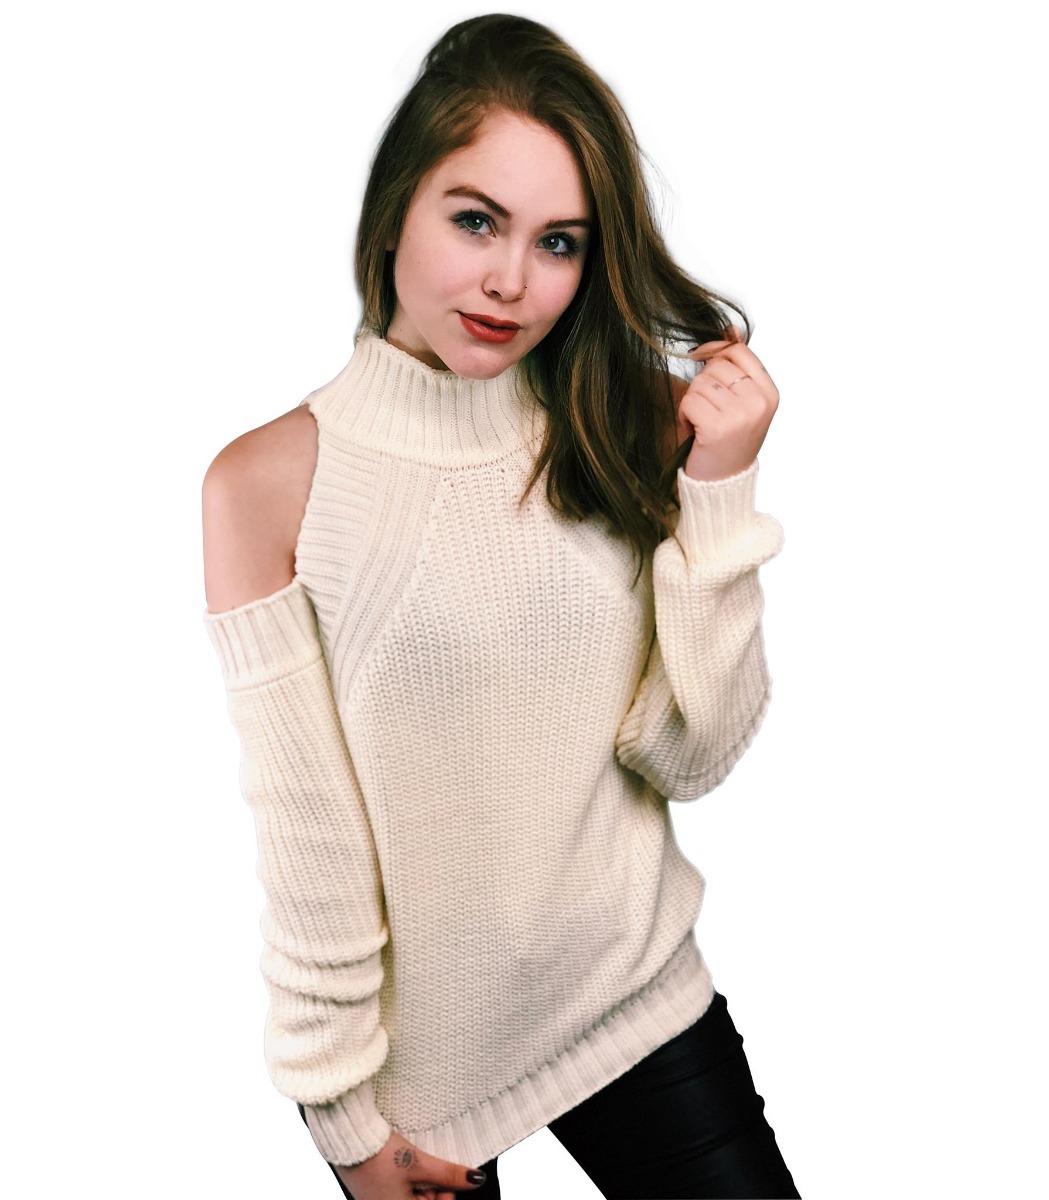 da685d0f95 blusa tricô tricot gola alta inverno malha ombro de fora. Carregando zoom.